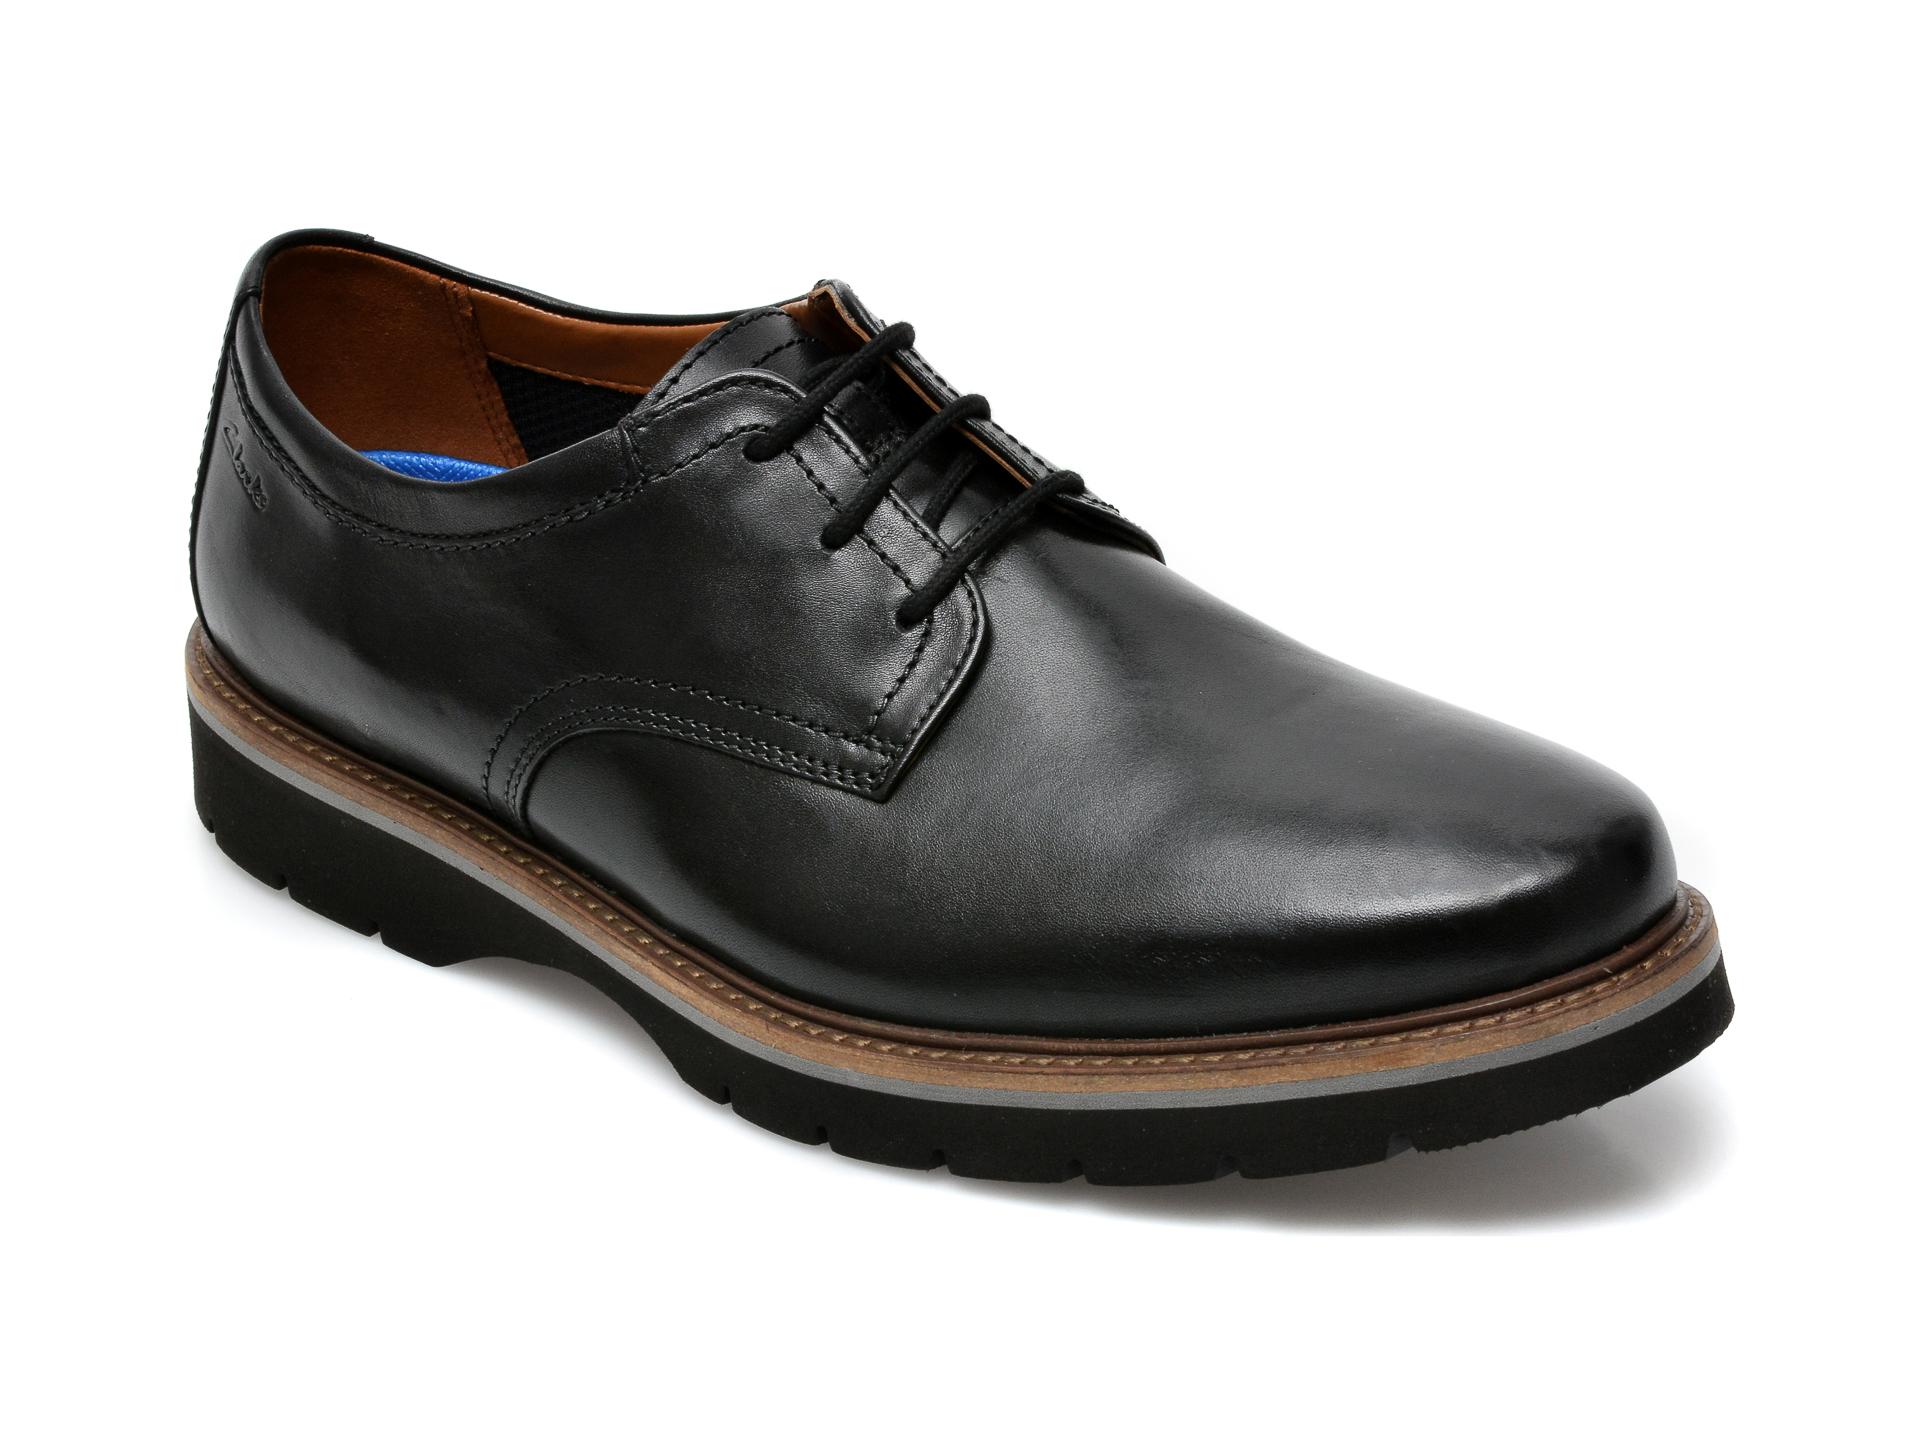 Pantofi CLARKS negri, Bayhill Plain, din piele naturala imagine otter.ro 2021